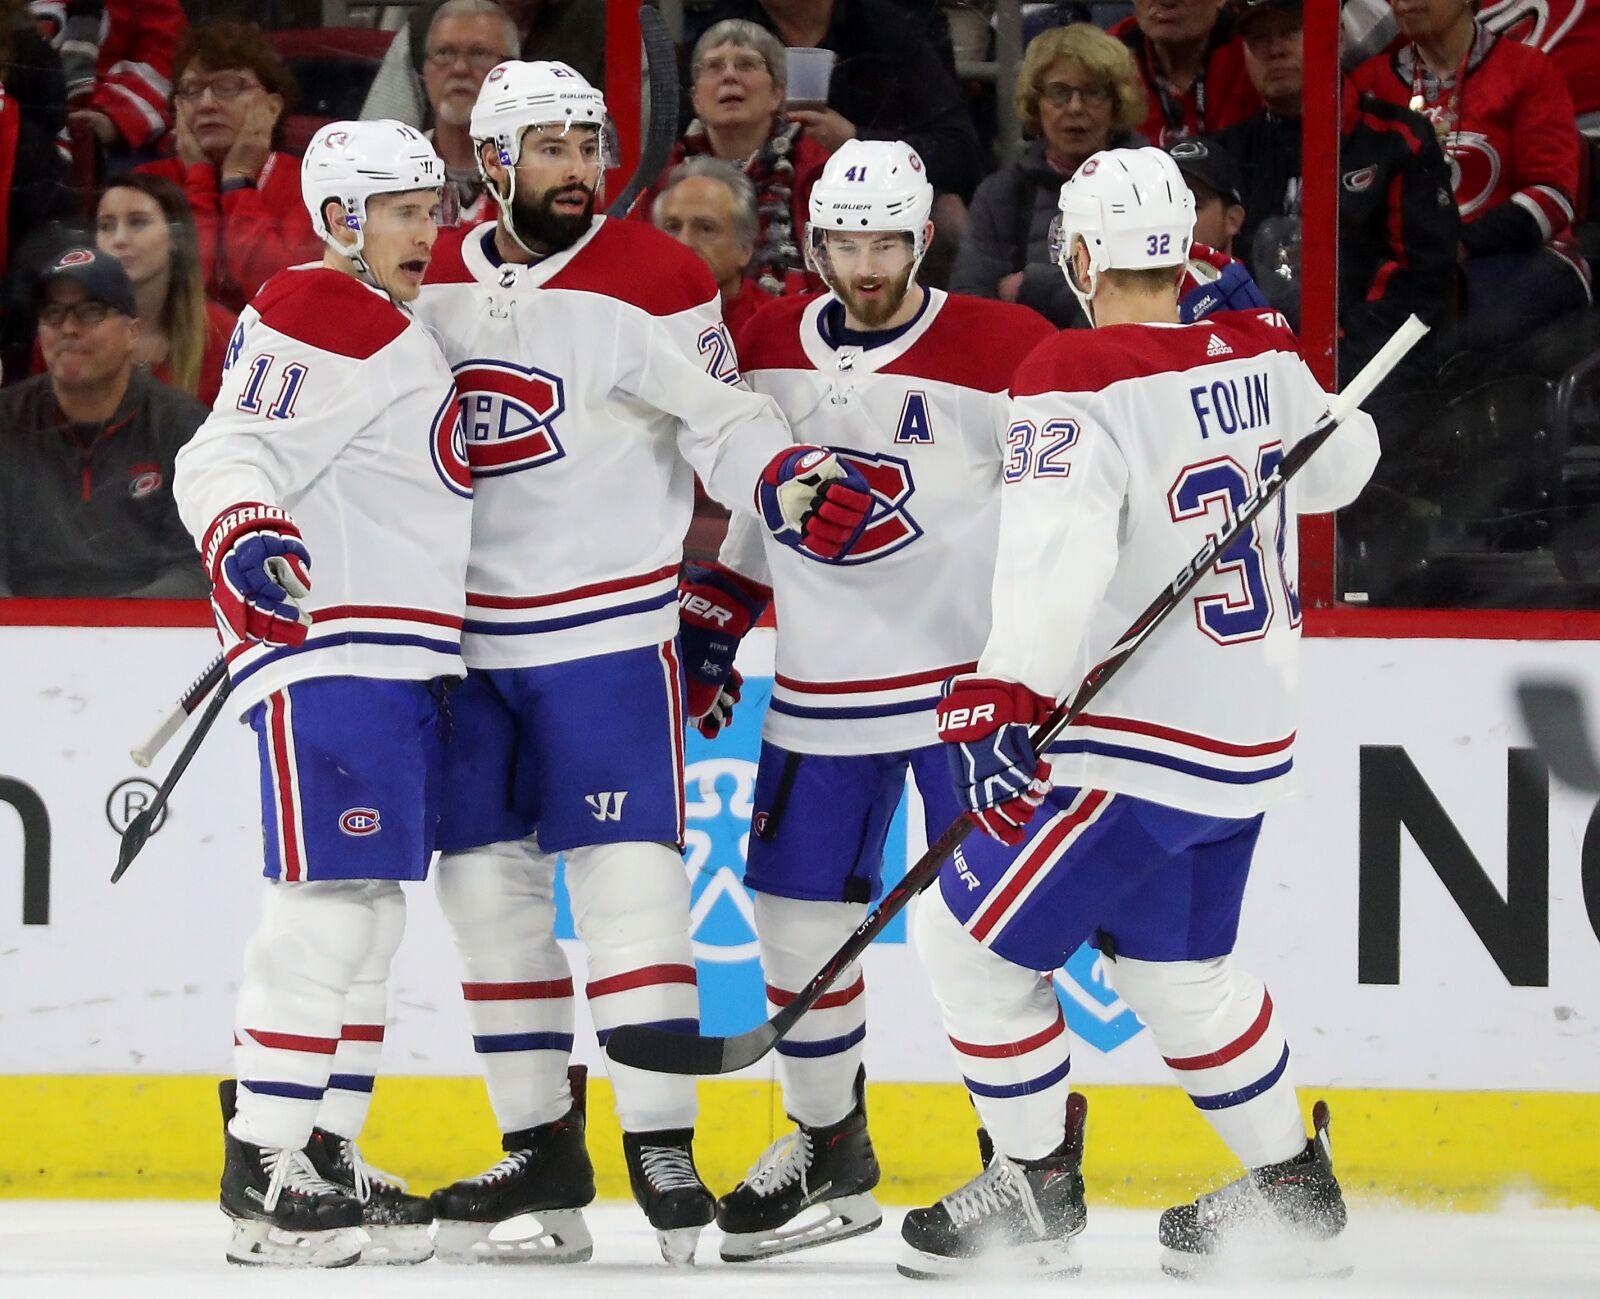 Montreal Canadiens: Who Will Be Odd Man Out When Jesperi Kotkaniemi Returns?